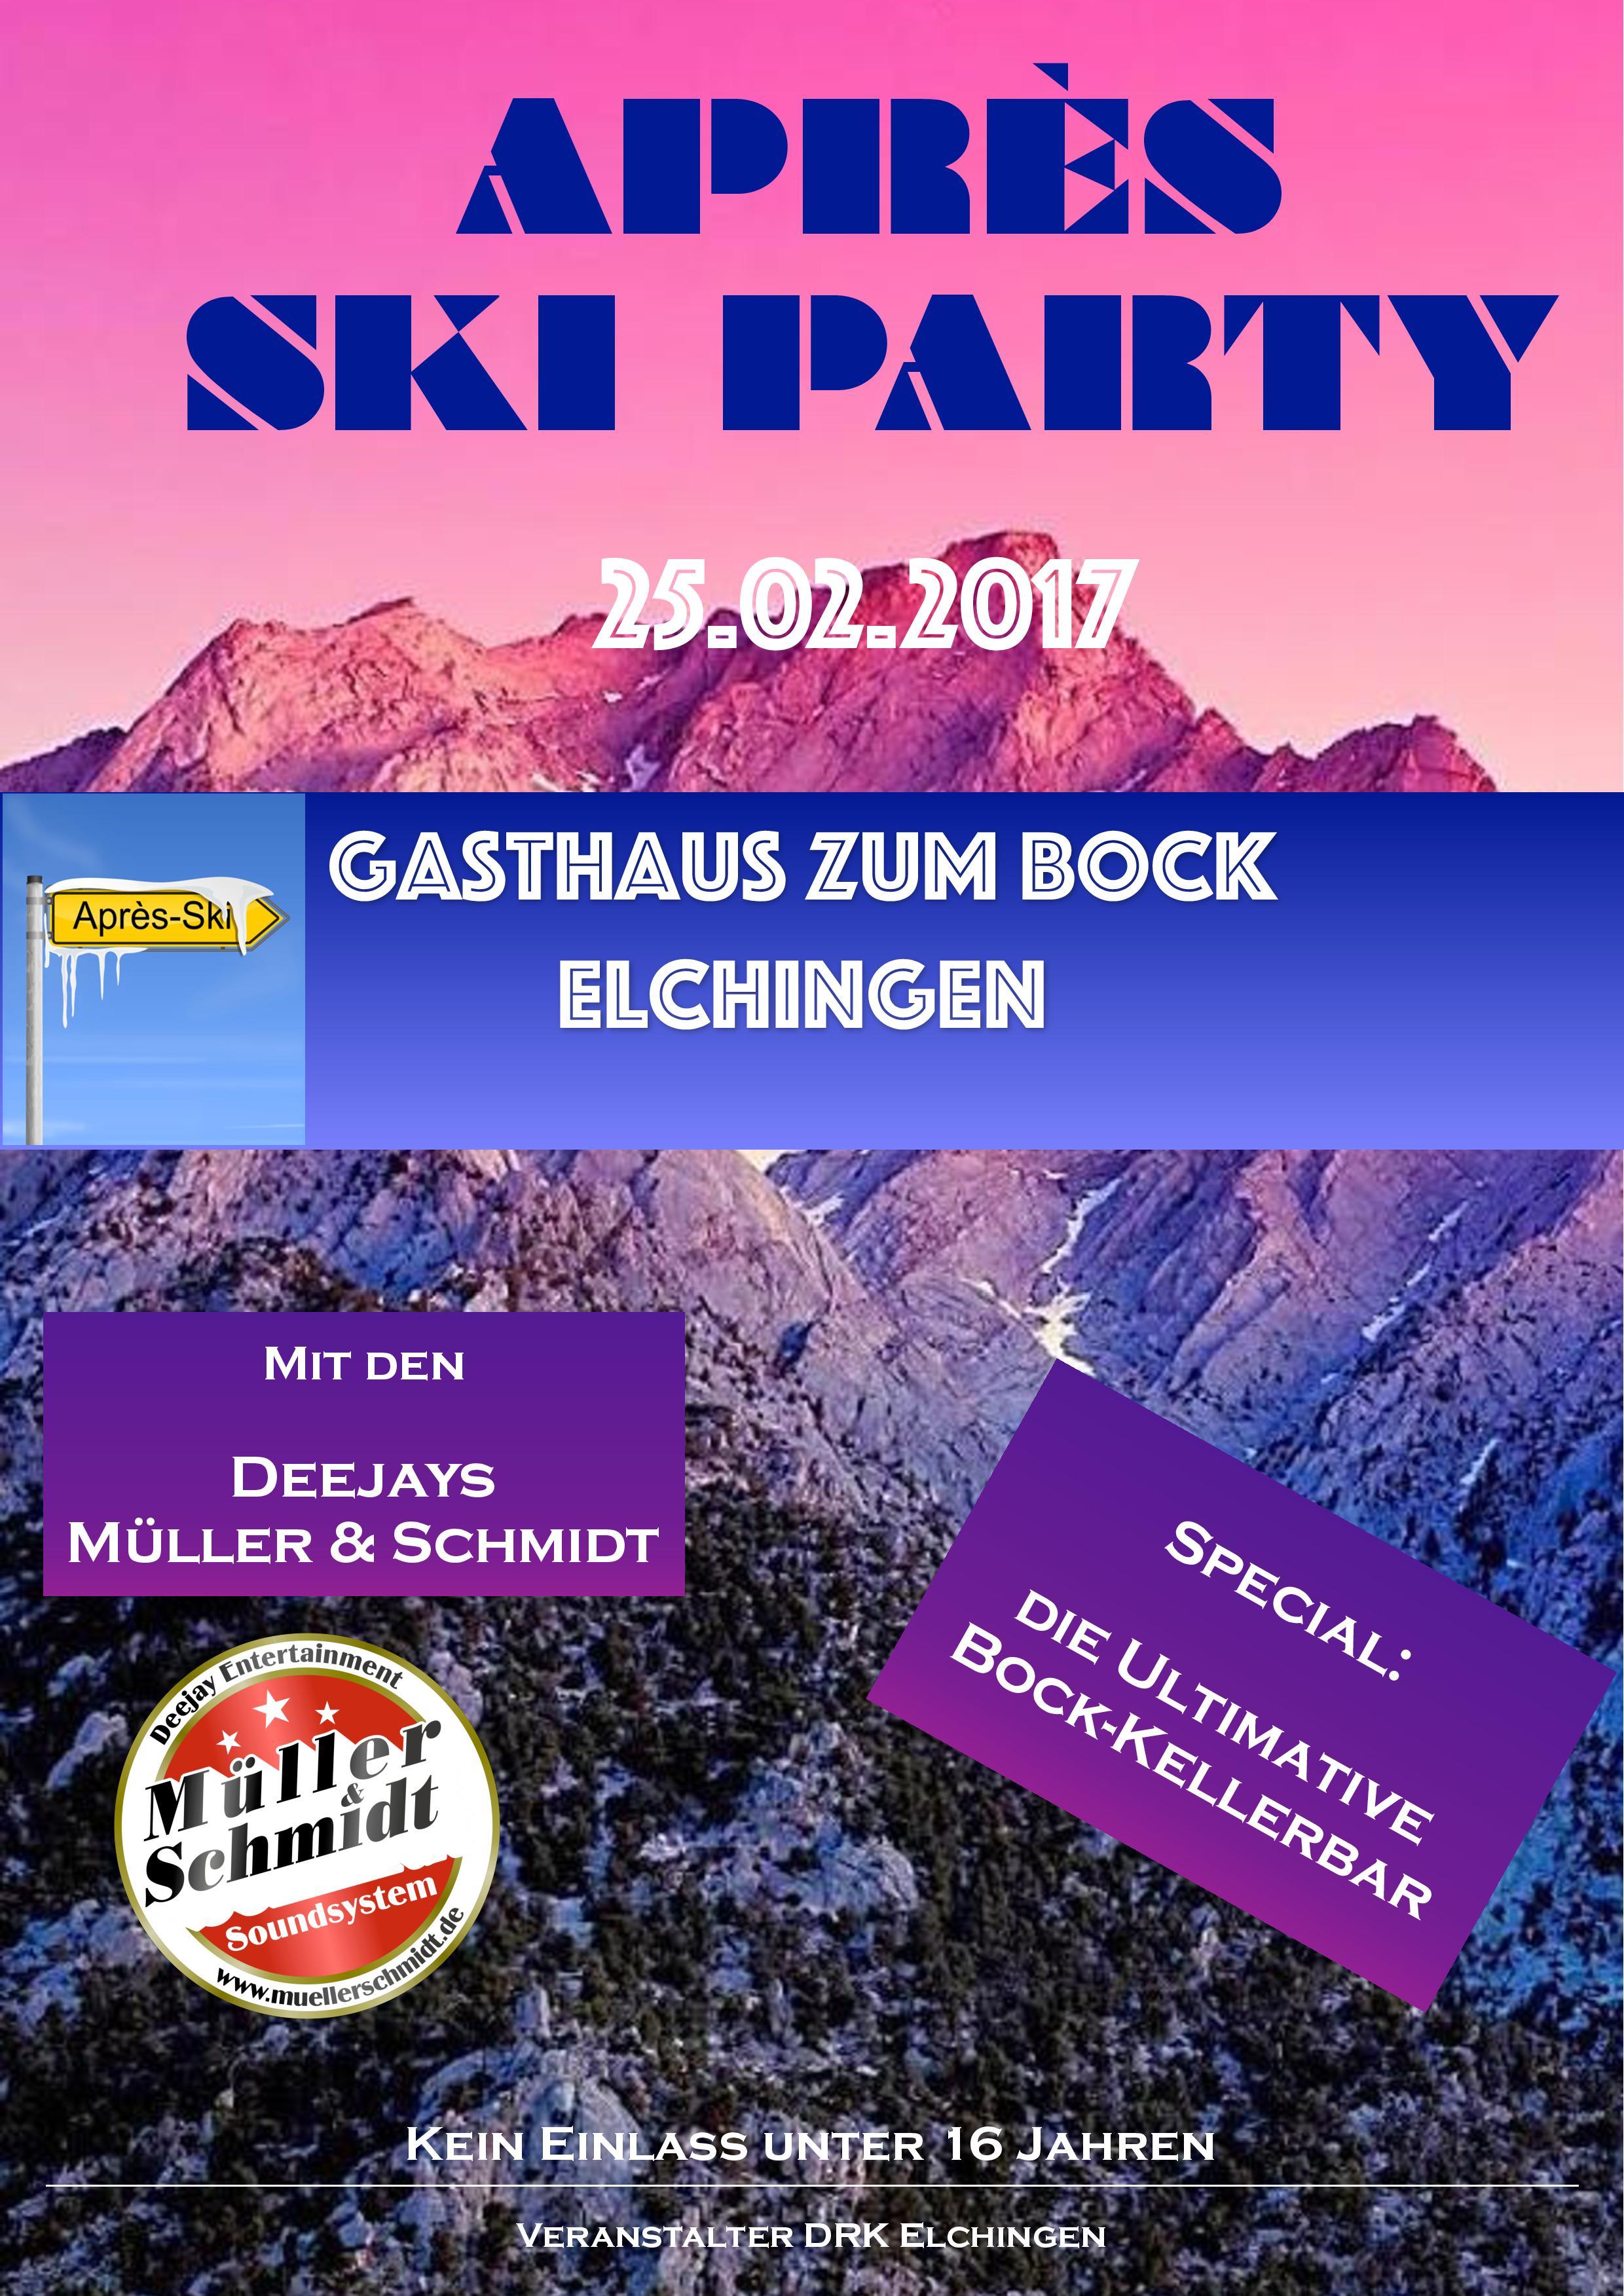 Apres Ski Party Elchingen DRK Fasching 2017